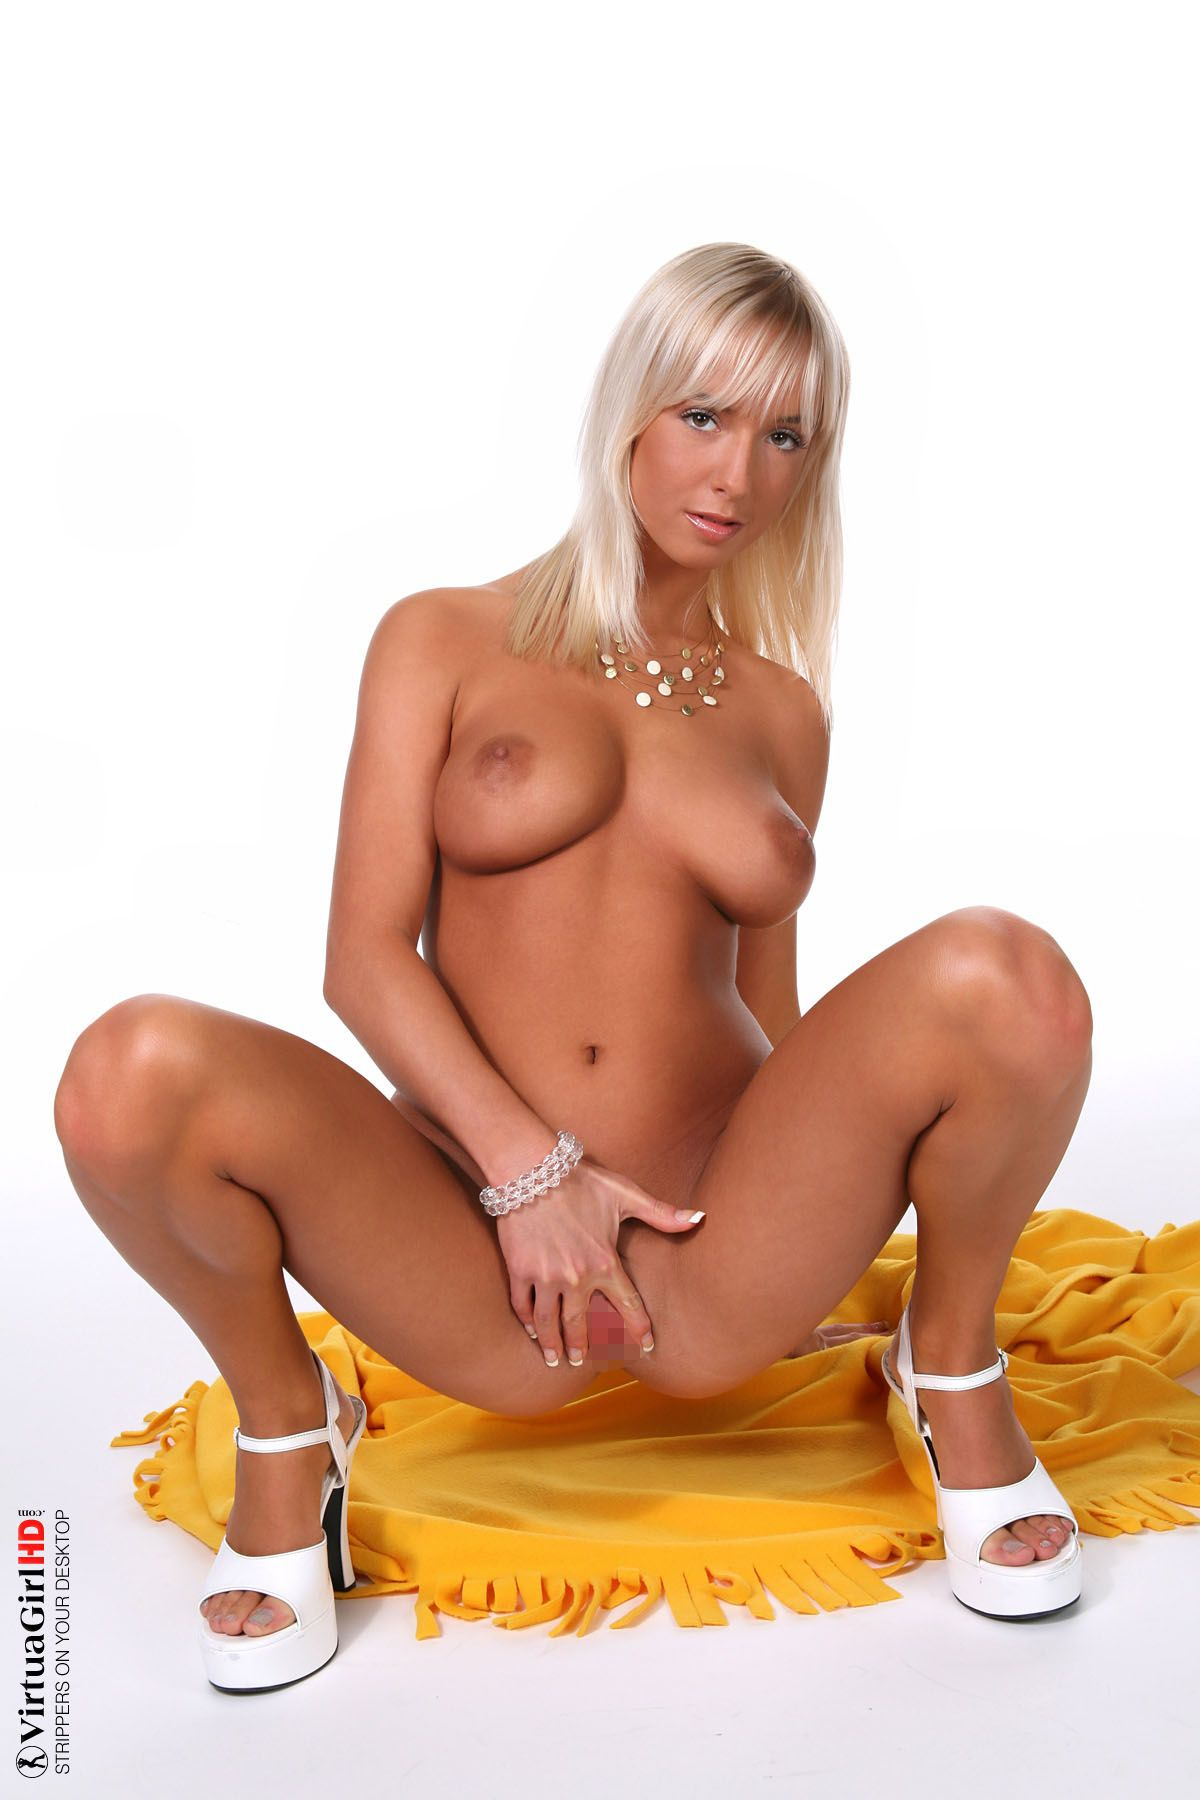 Natali Blond - COCONUT MILK 06